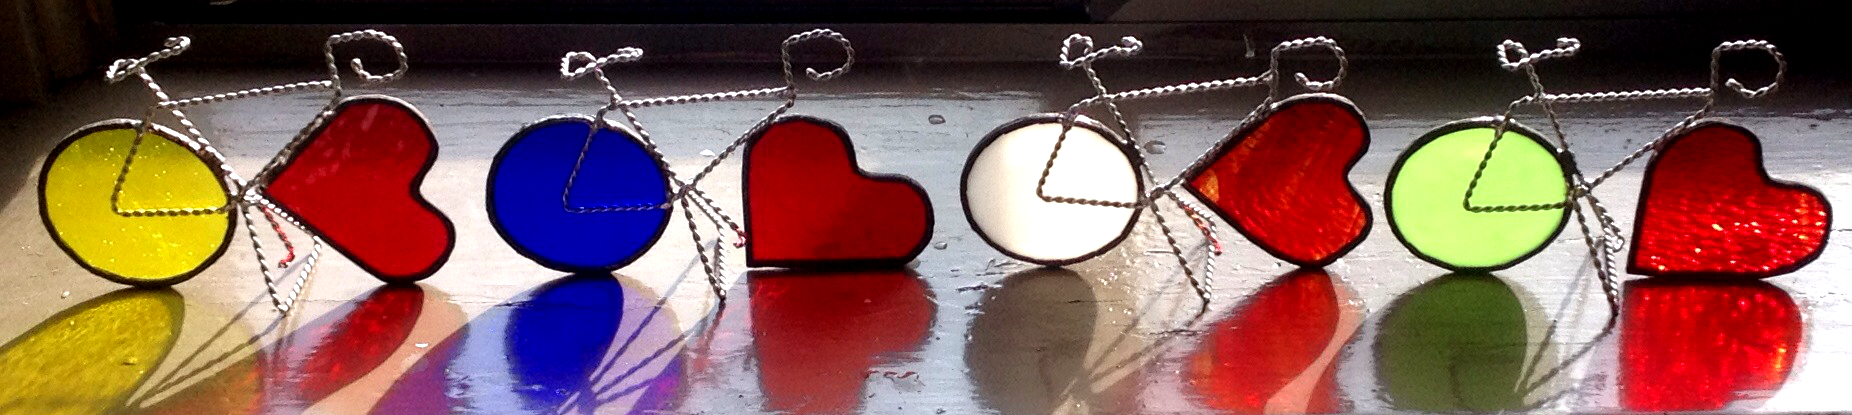 heartbikes.JPG